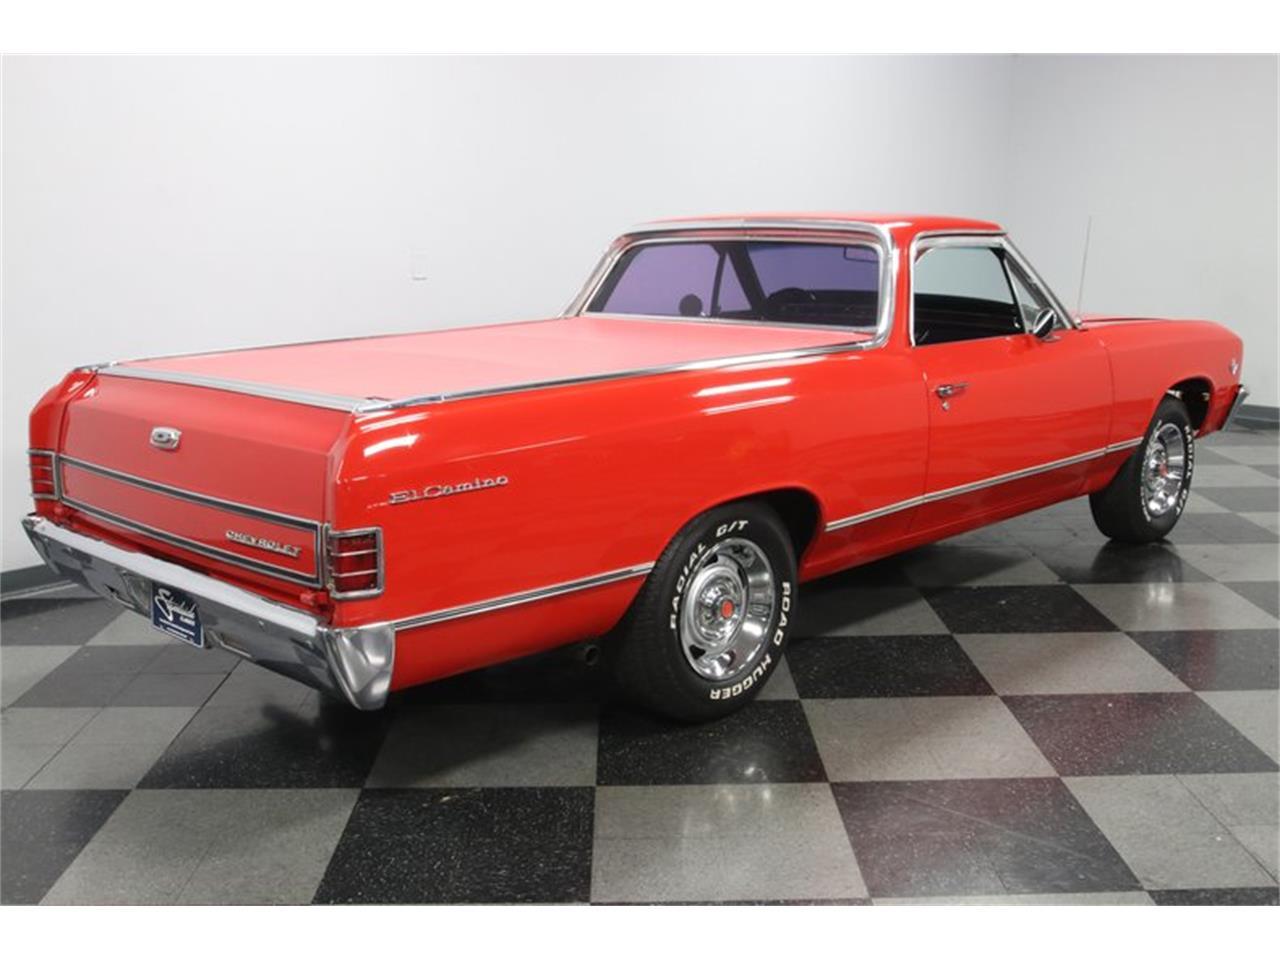 1967 Chevrolet El Camino (CC-1327998) for sale in Concord, North Carolina